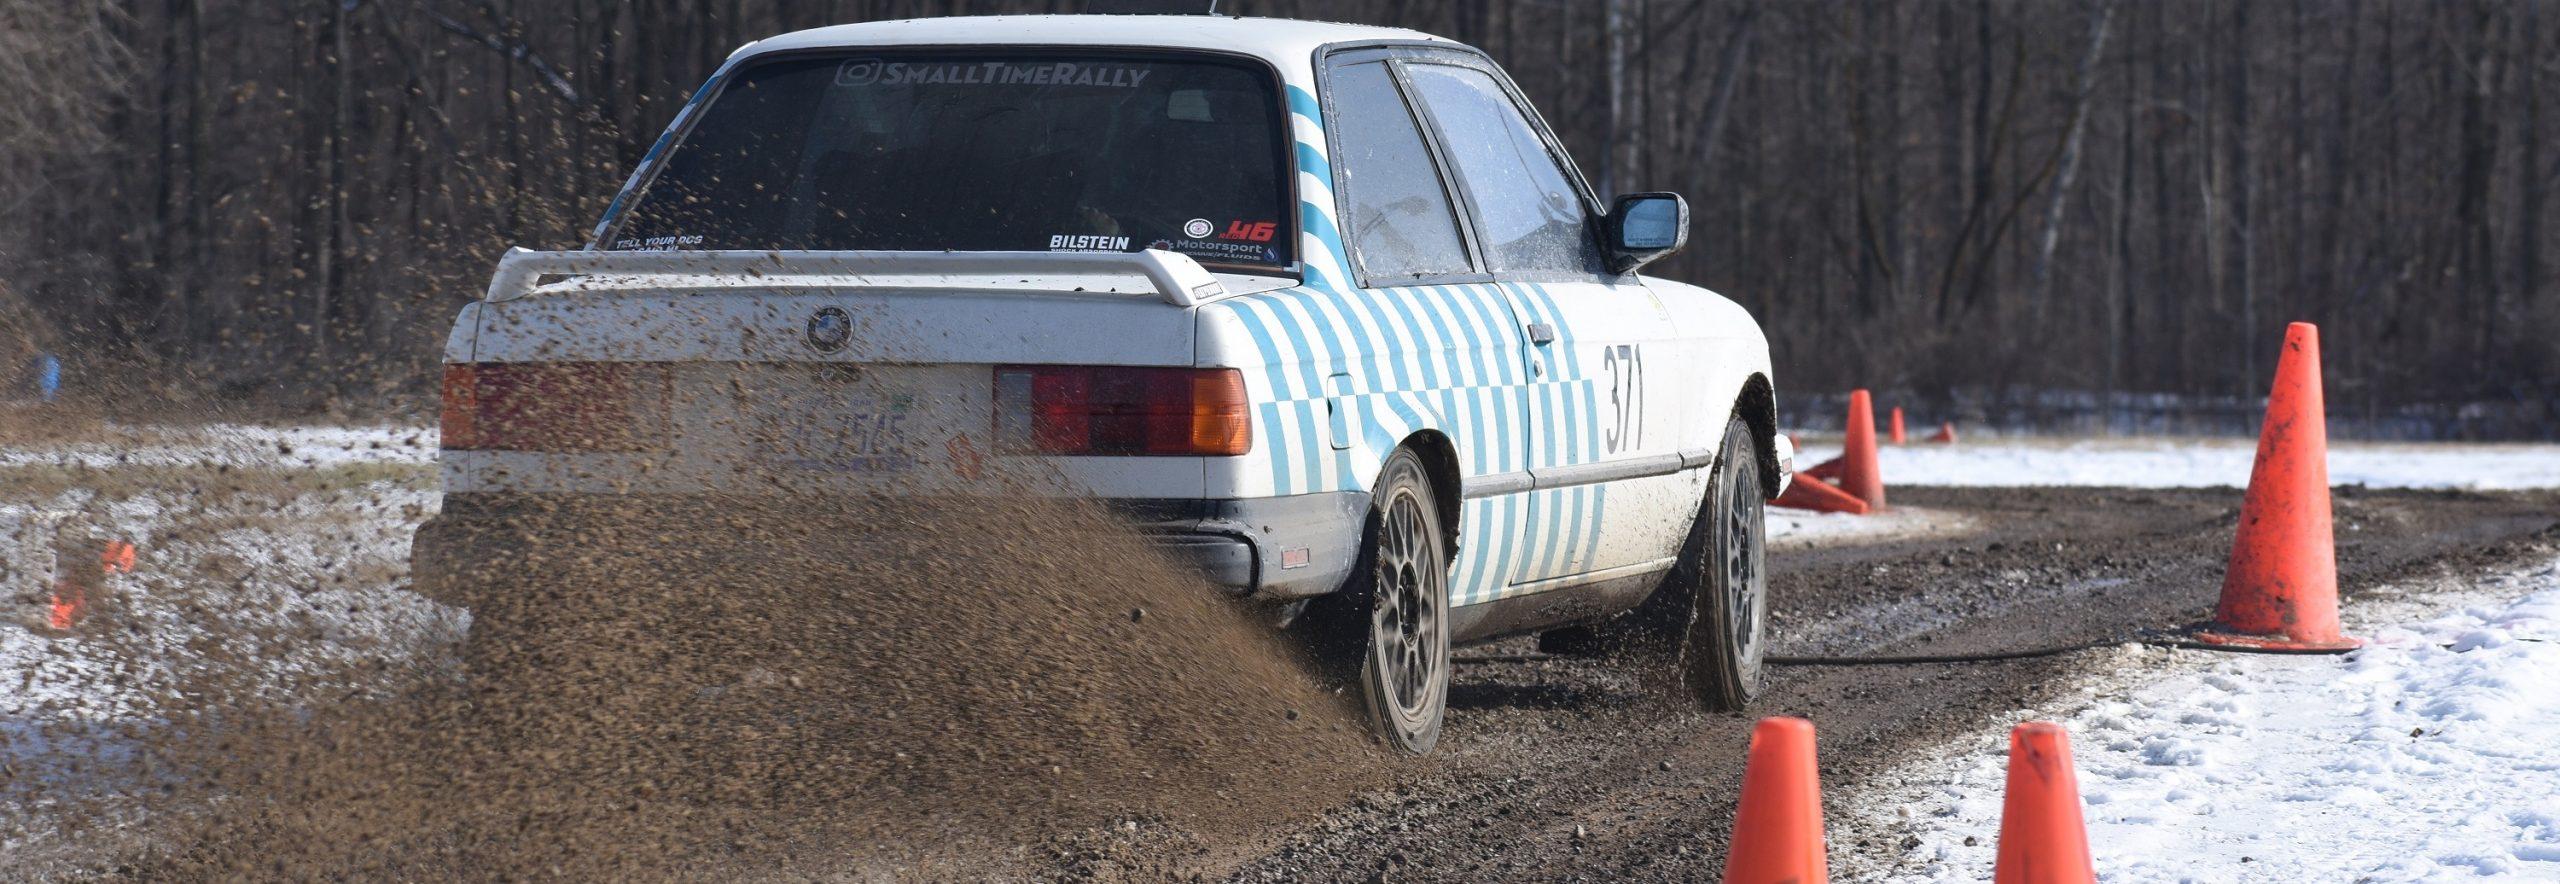 Season Opener RallyCross Rescheduled